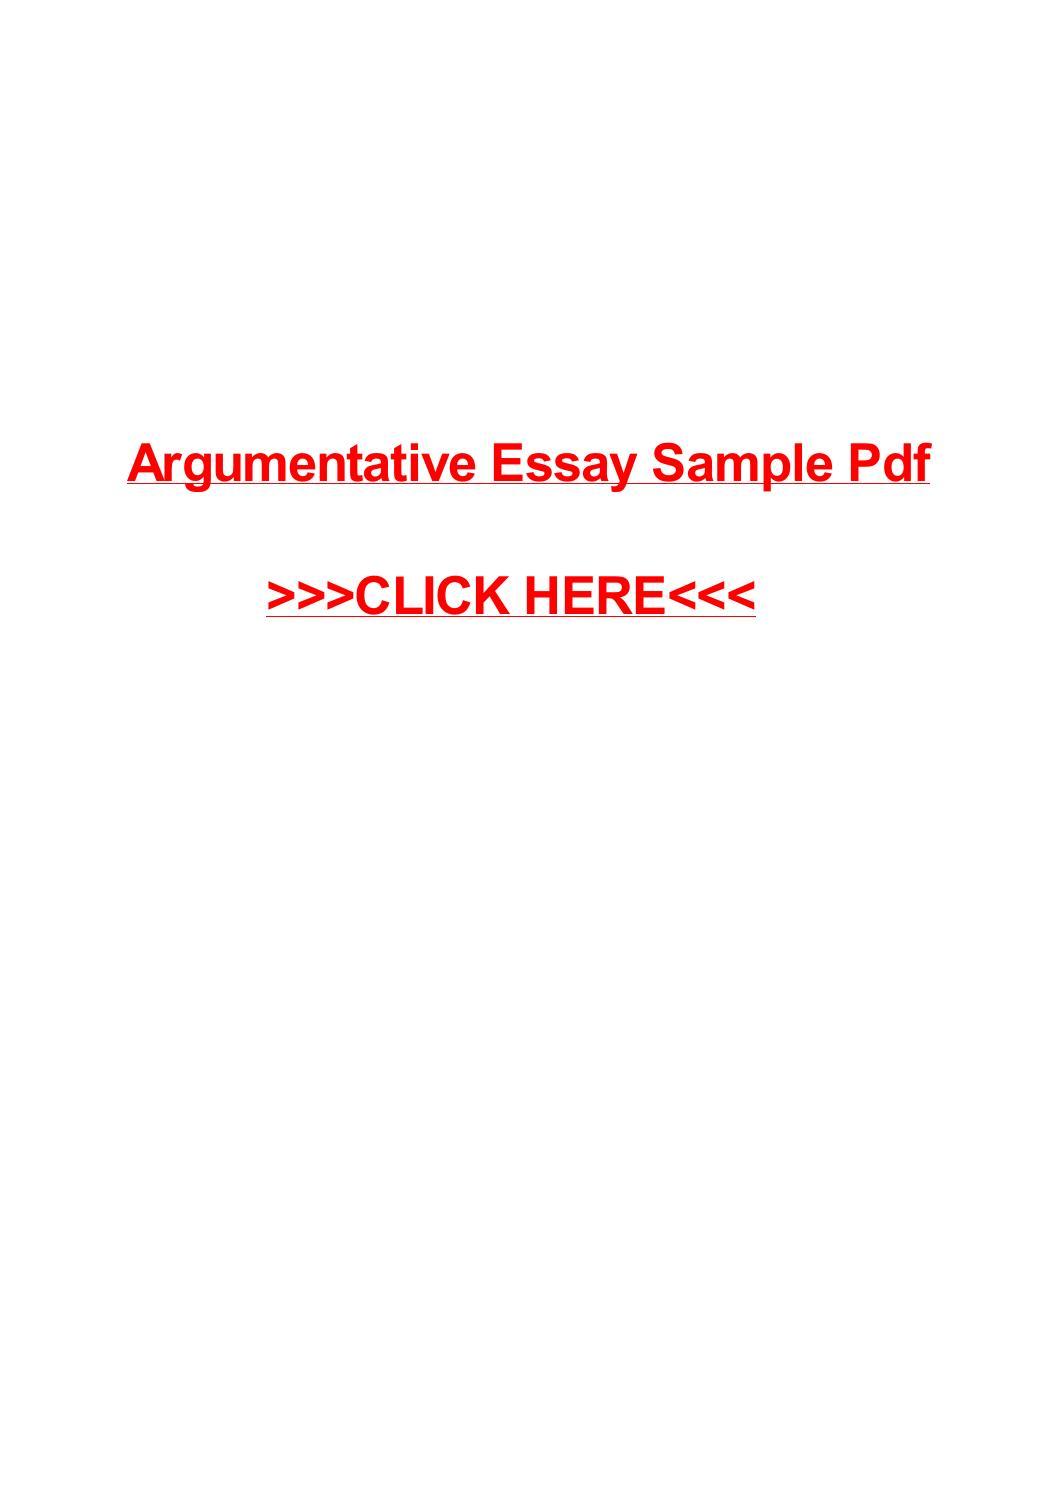 Argumentative Essay Sample Pdf By May Pilon